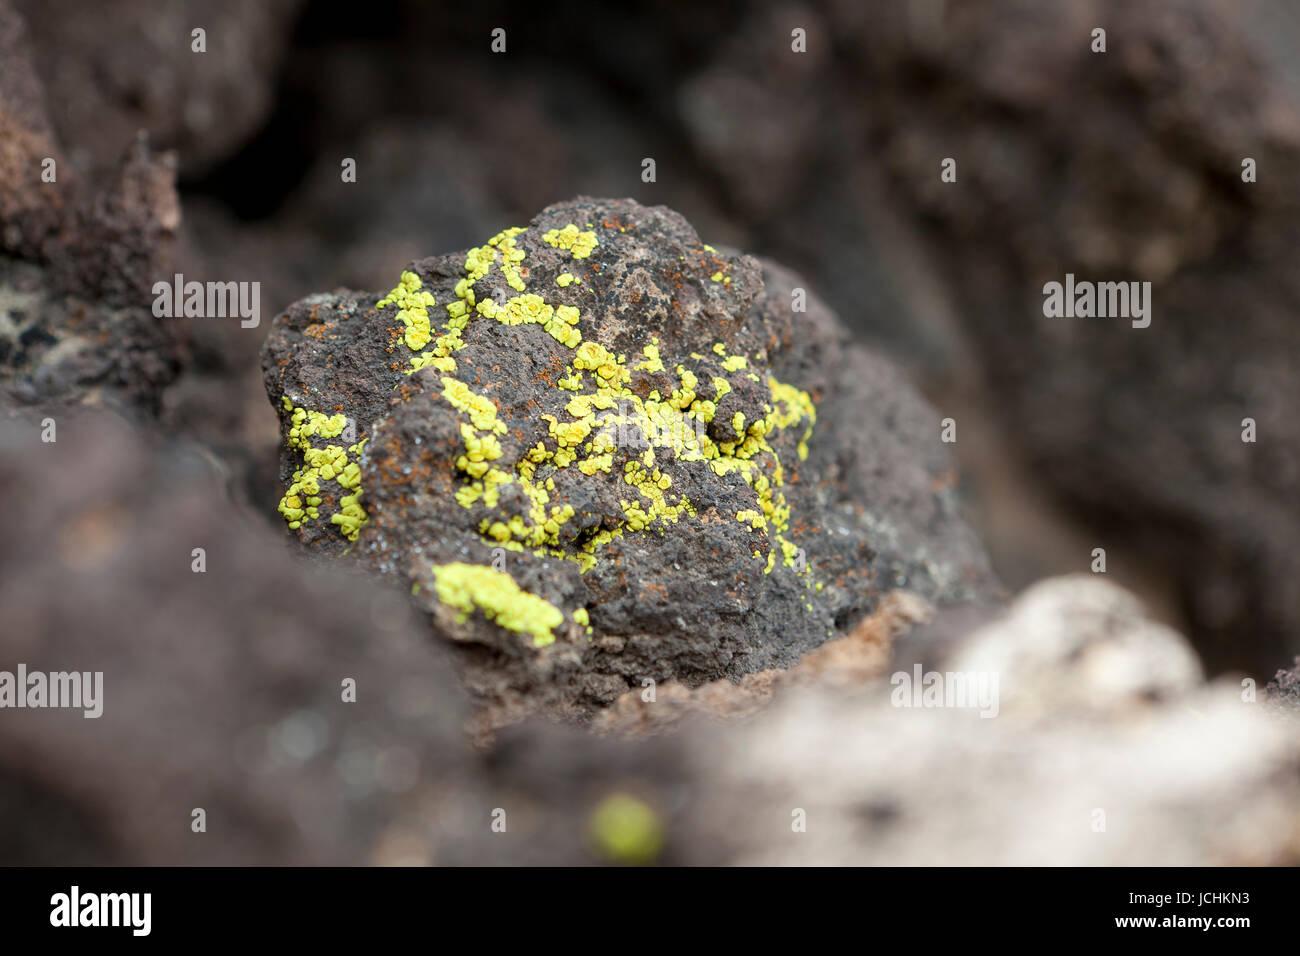 Lichens on rock (Epilithic crustose lichen) - Arizona, USA - Stock Image